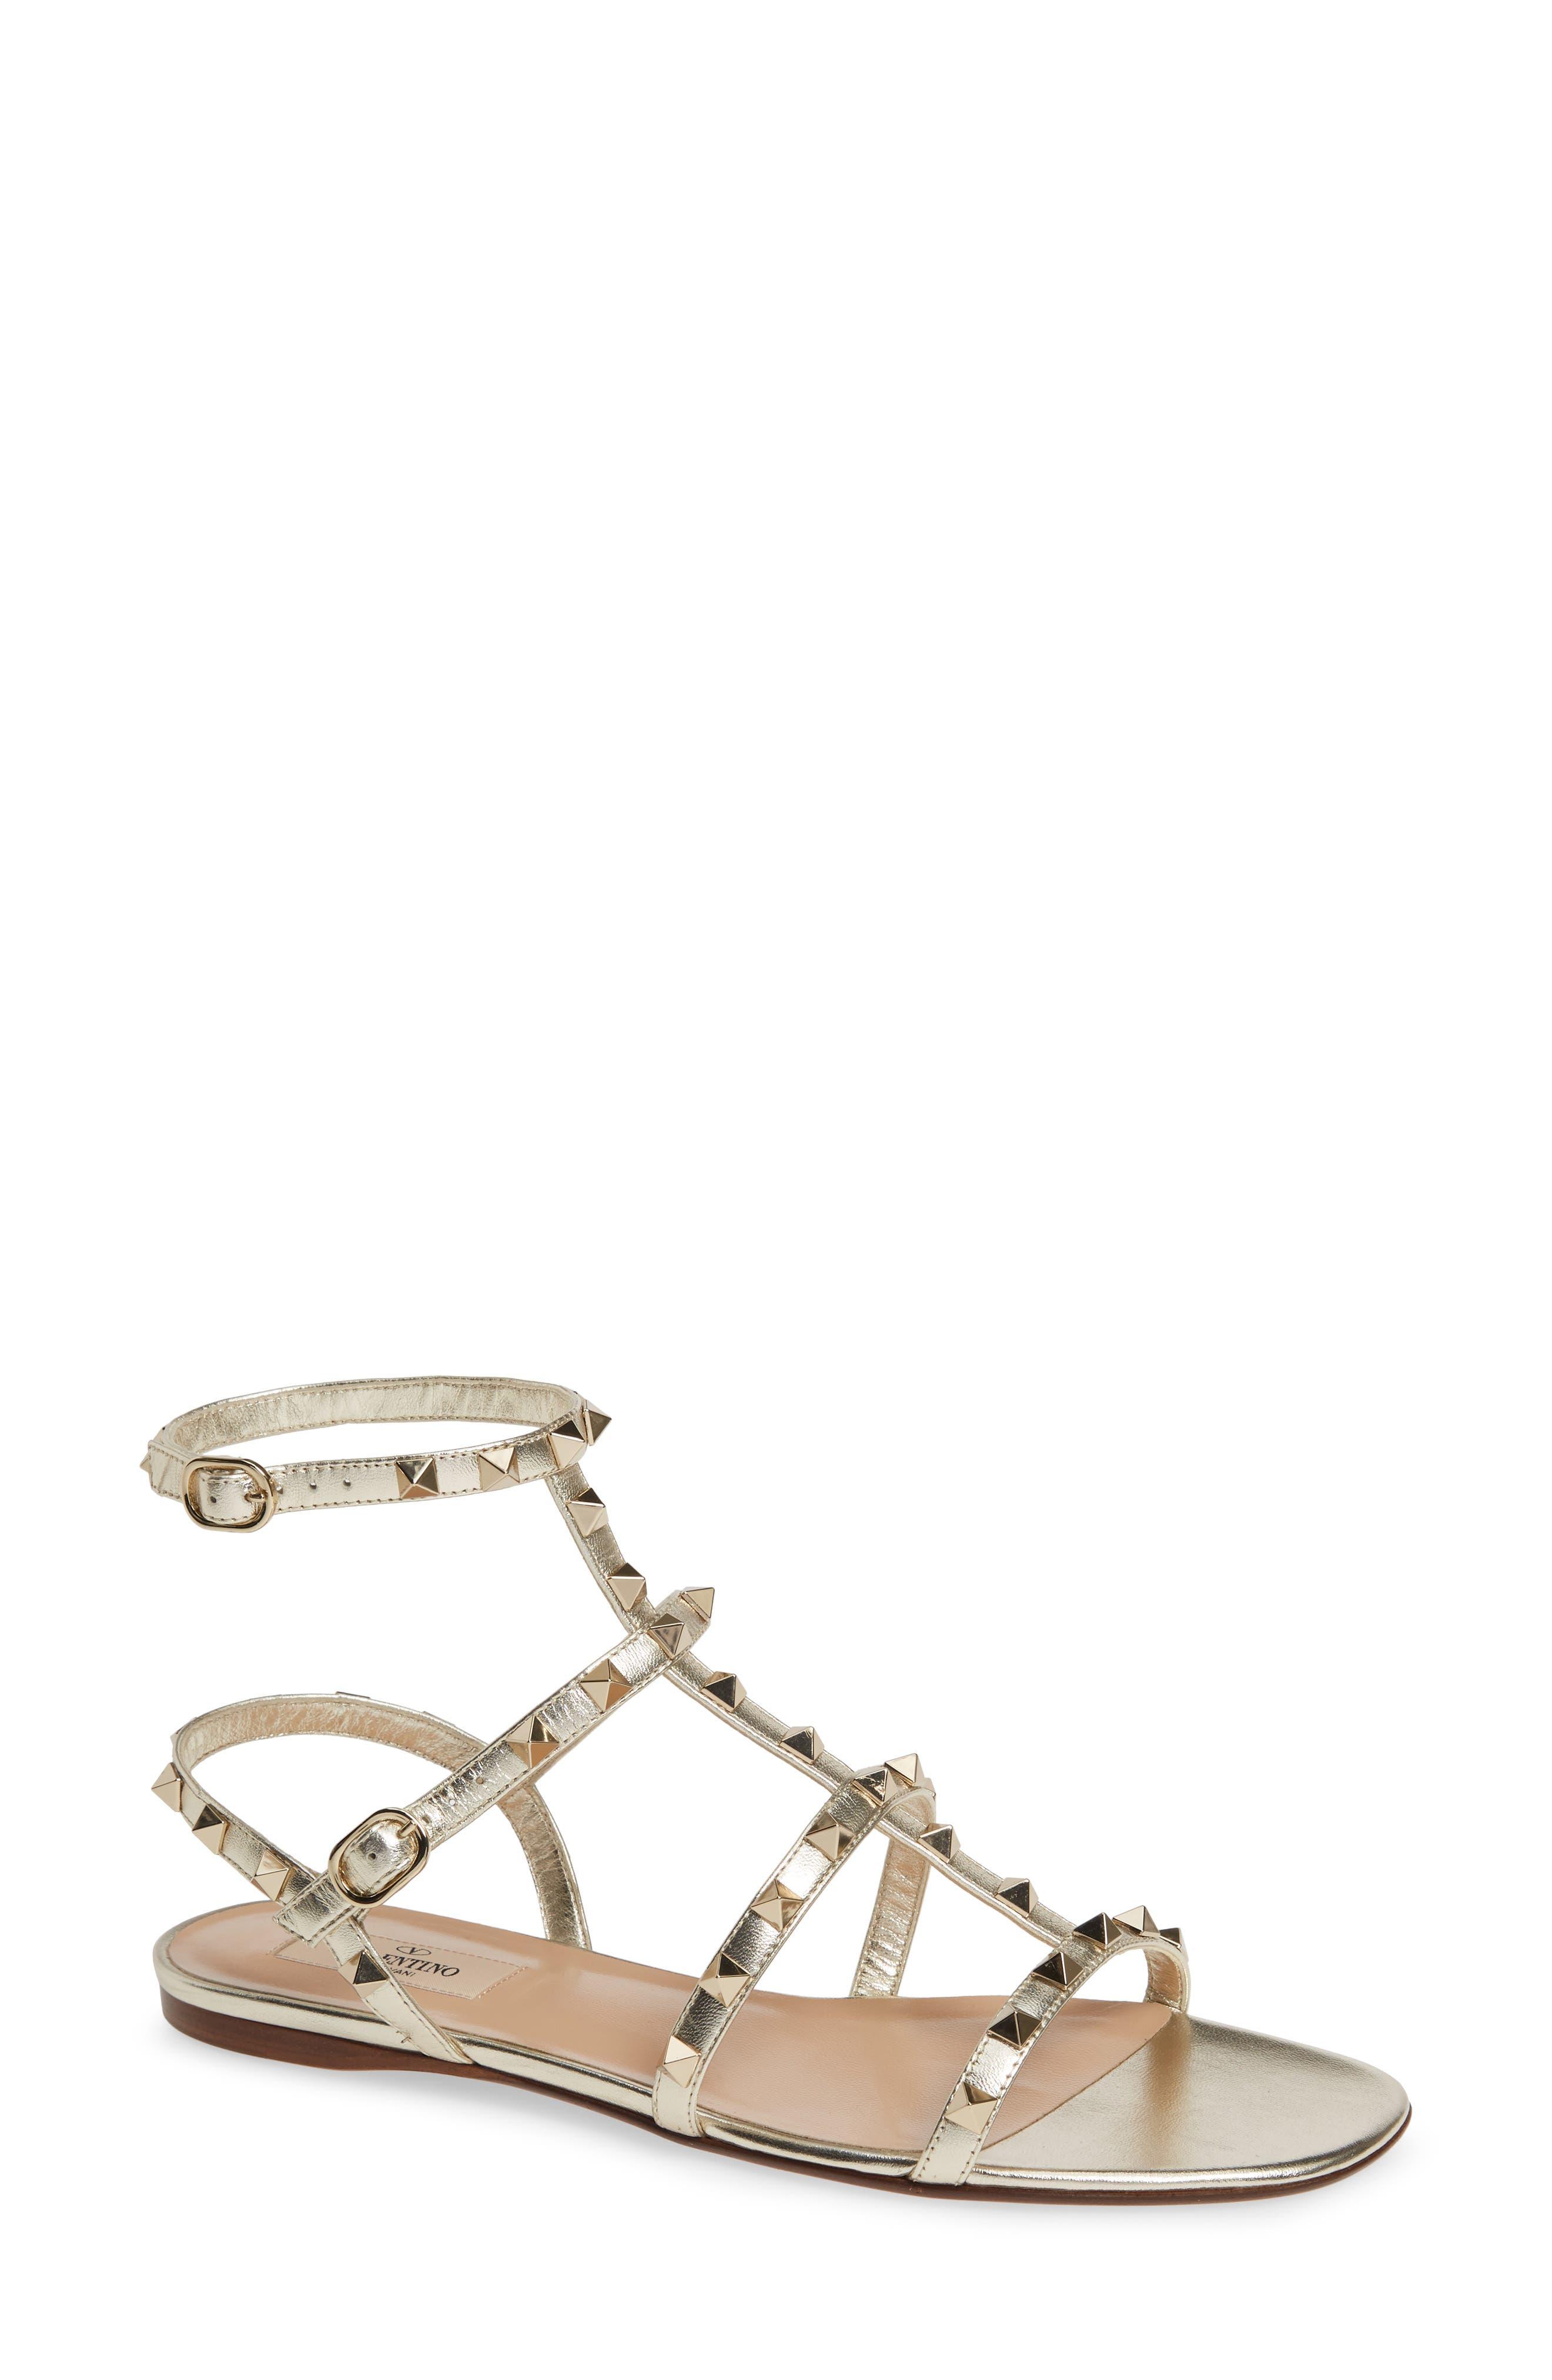 VALENTINO GARAVANI Rockstud Metallic Gladiator Sandal (Women)